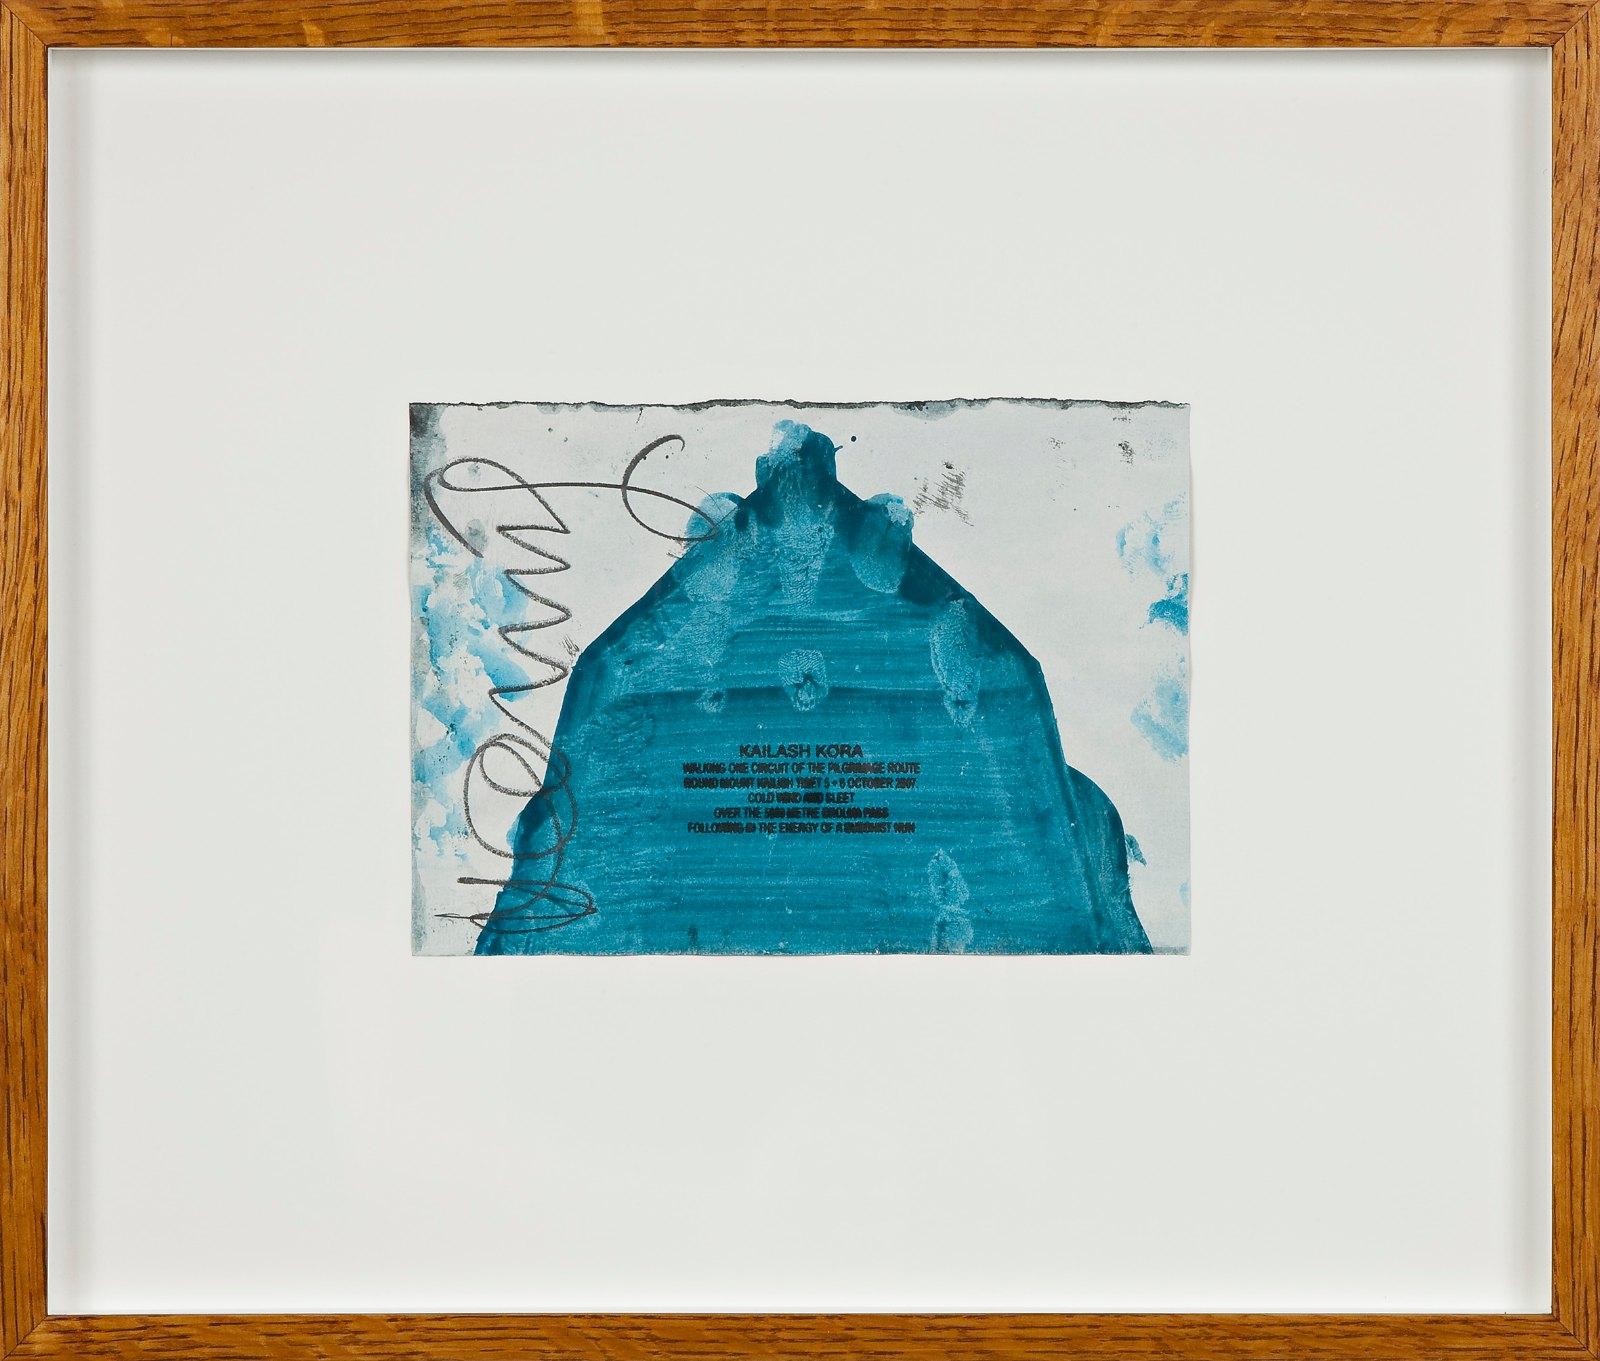 Kailash Kora, 2007, ink walk text on acrylic in artist frame, 14.5 x 20.7 cm